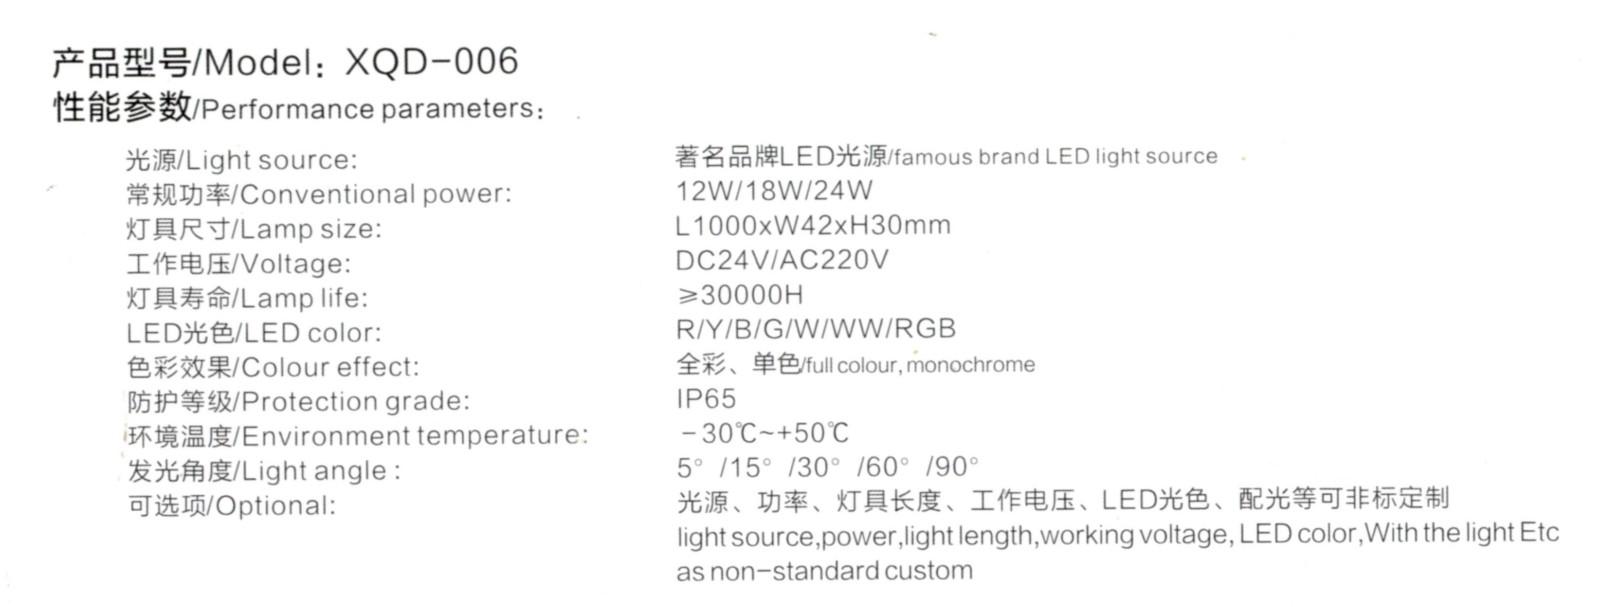 LED洗墙灯Model∶XQD-006参数.jpg